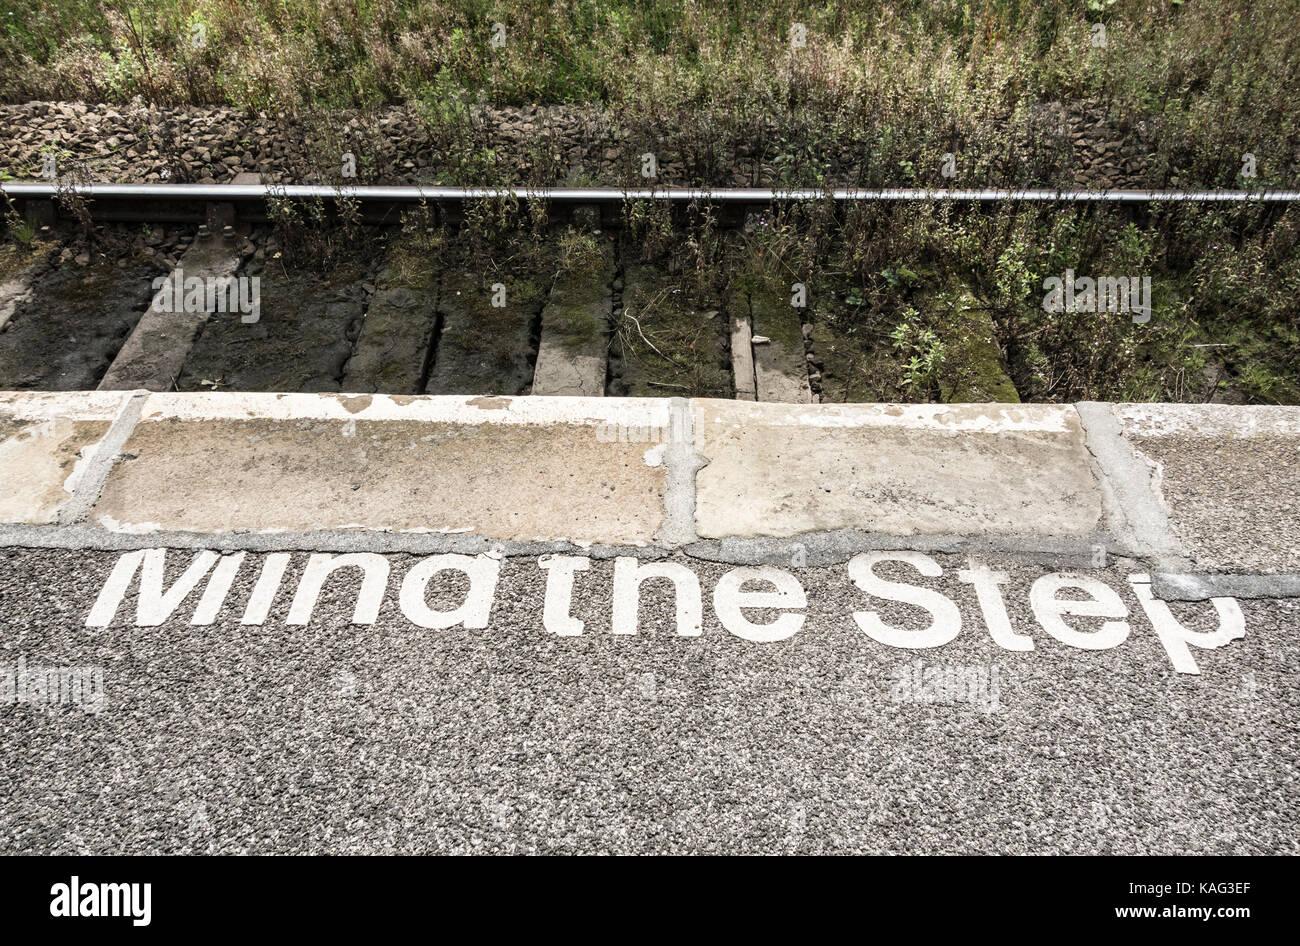 Mind the step painted on railway station platform. UK - Stock Image